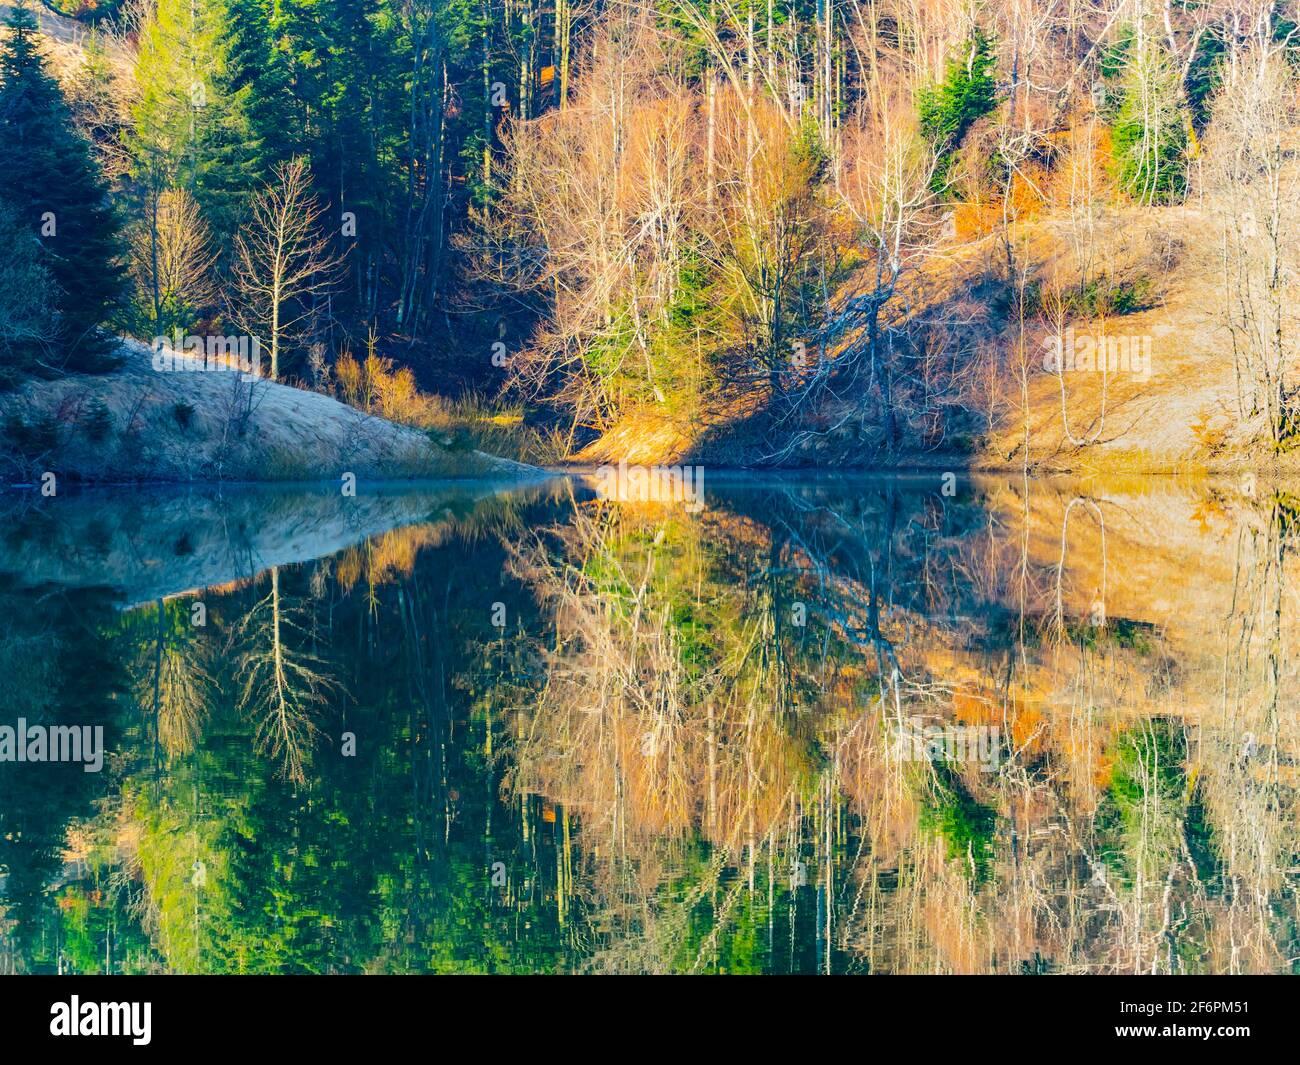 Zen zen splendid gorgeous vibrant colors idyllic remarkable appealing Lokve lake in Croatia Europe Stock Photo